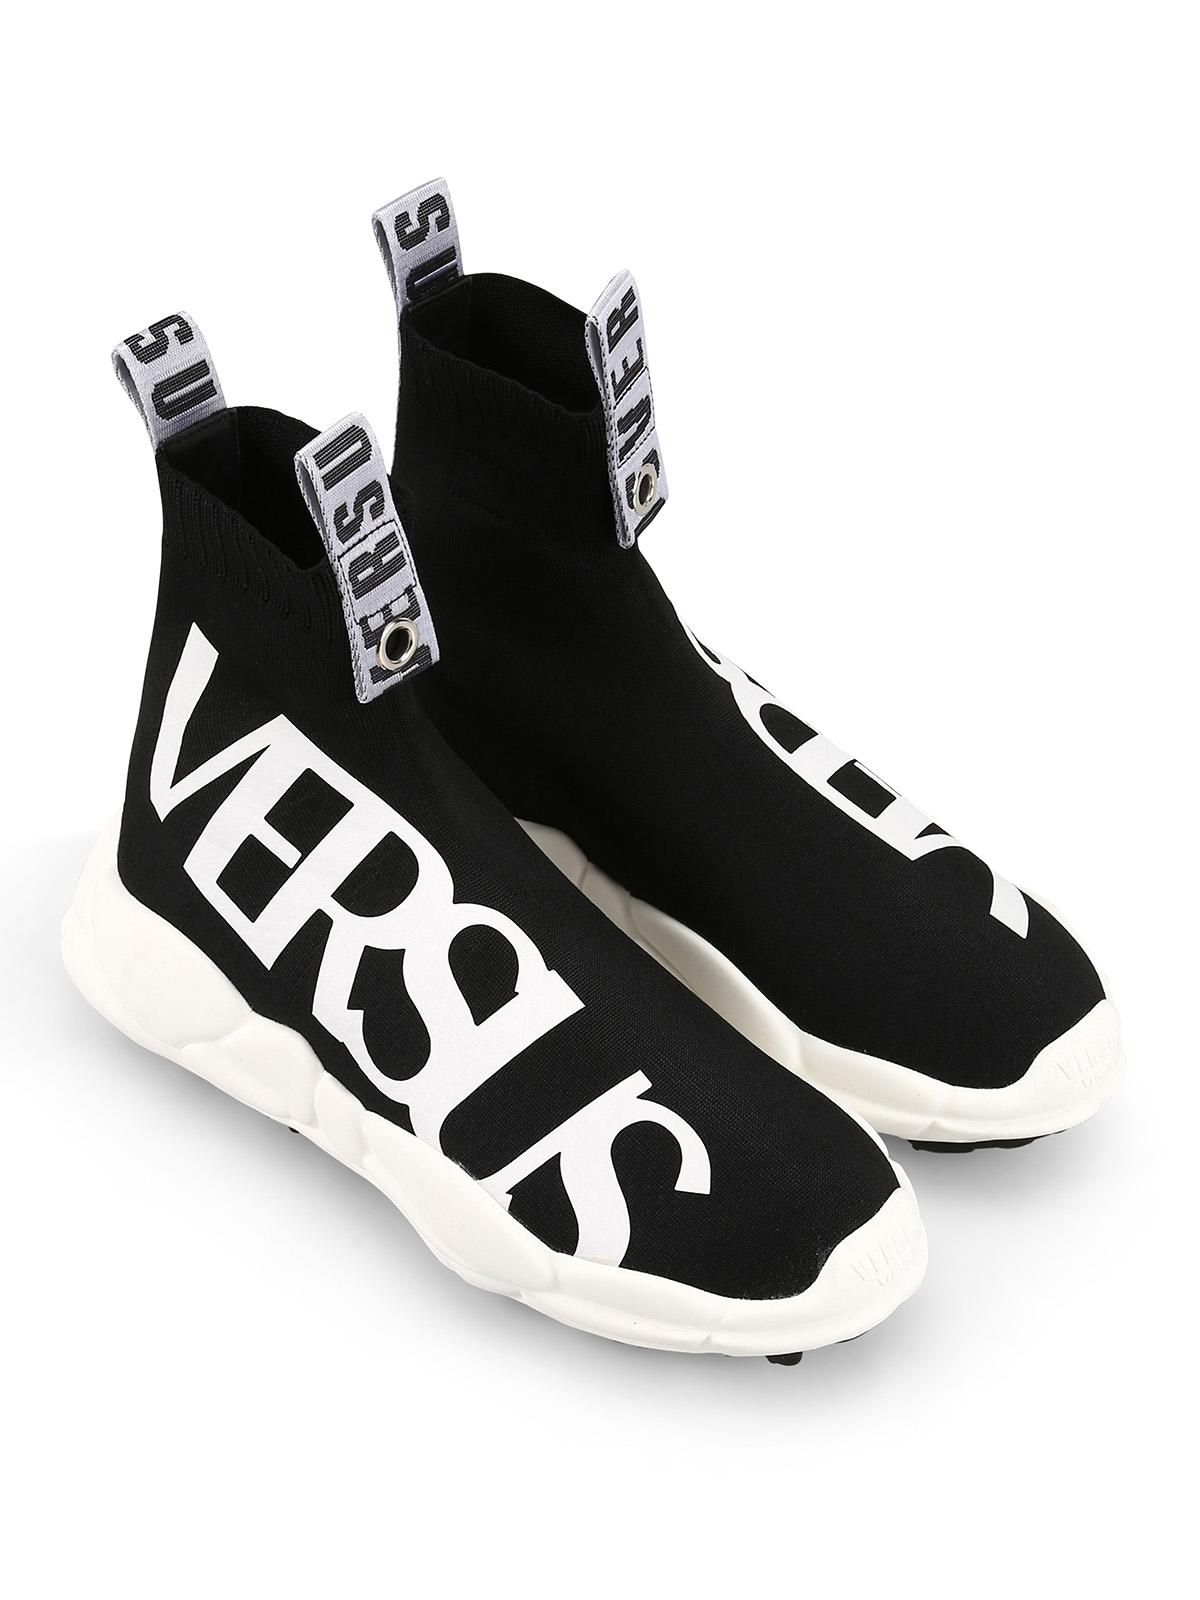 Versus Versace - Logo sock sneakers